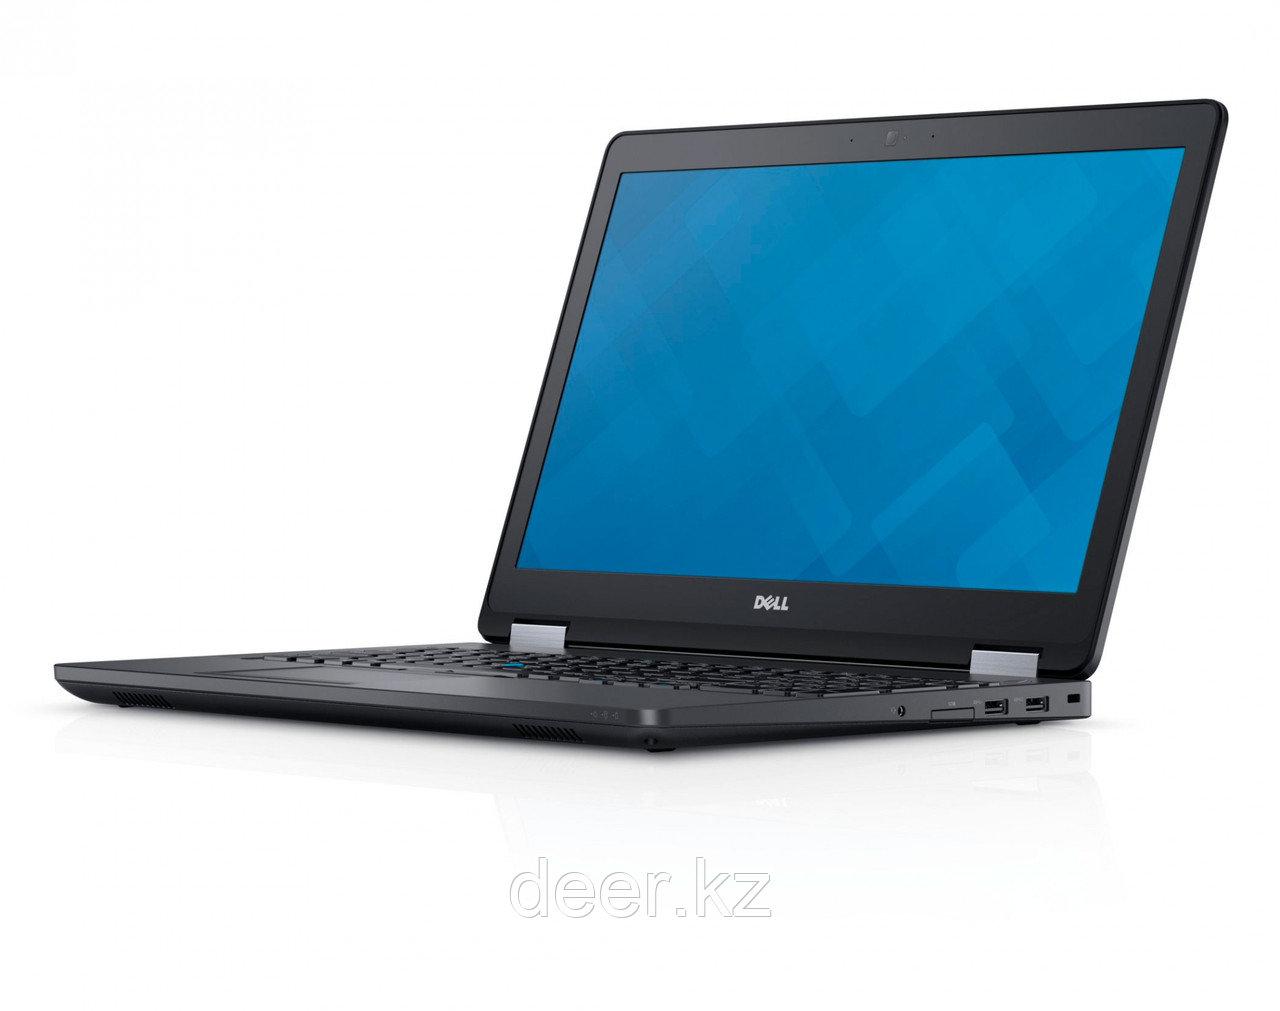 Мобильная рабочая станция Dell 15,6 ''/Precision 5510 /Intel Core i5 6300HQ 210-AFWL